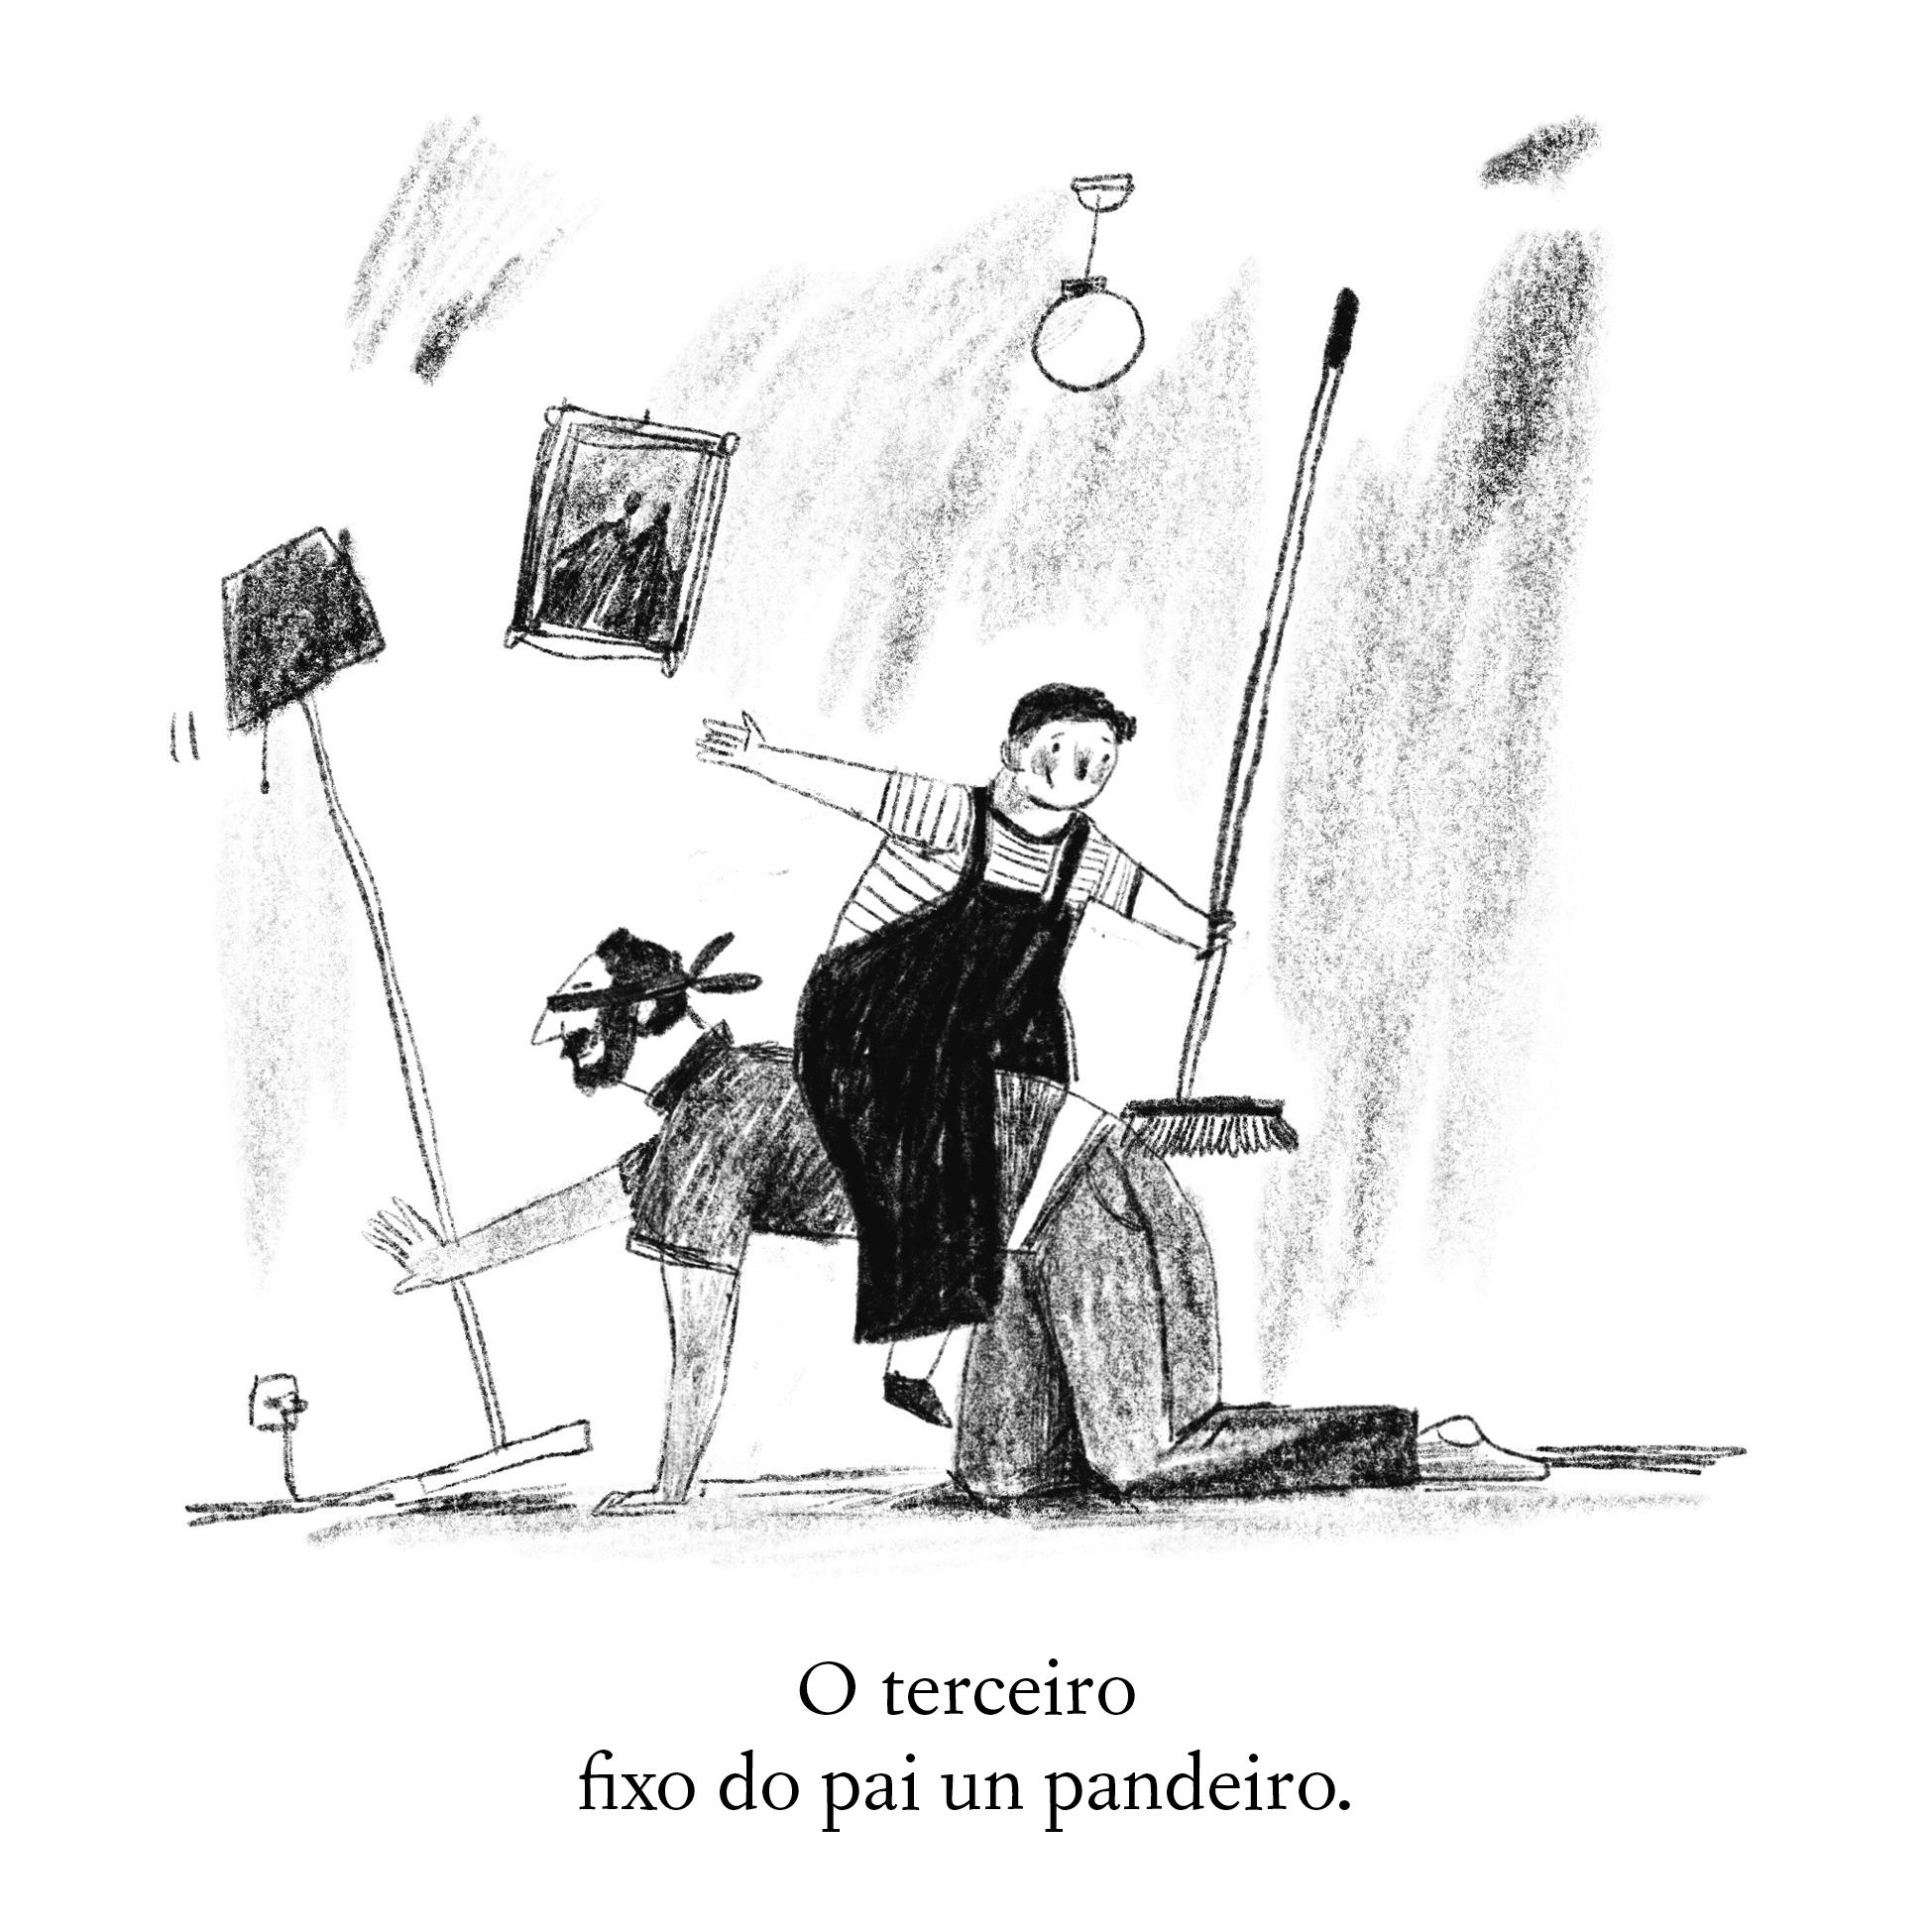 #euquedonacasa - terceiro